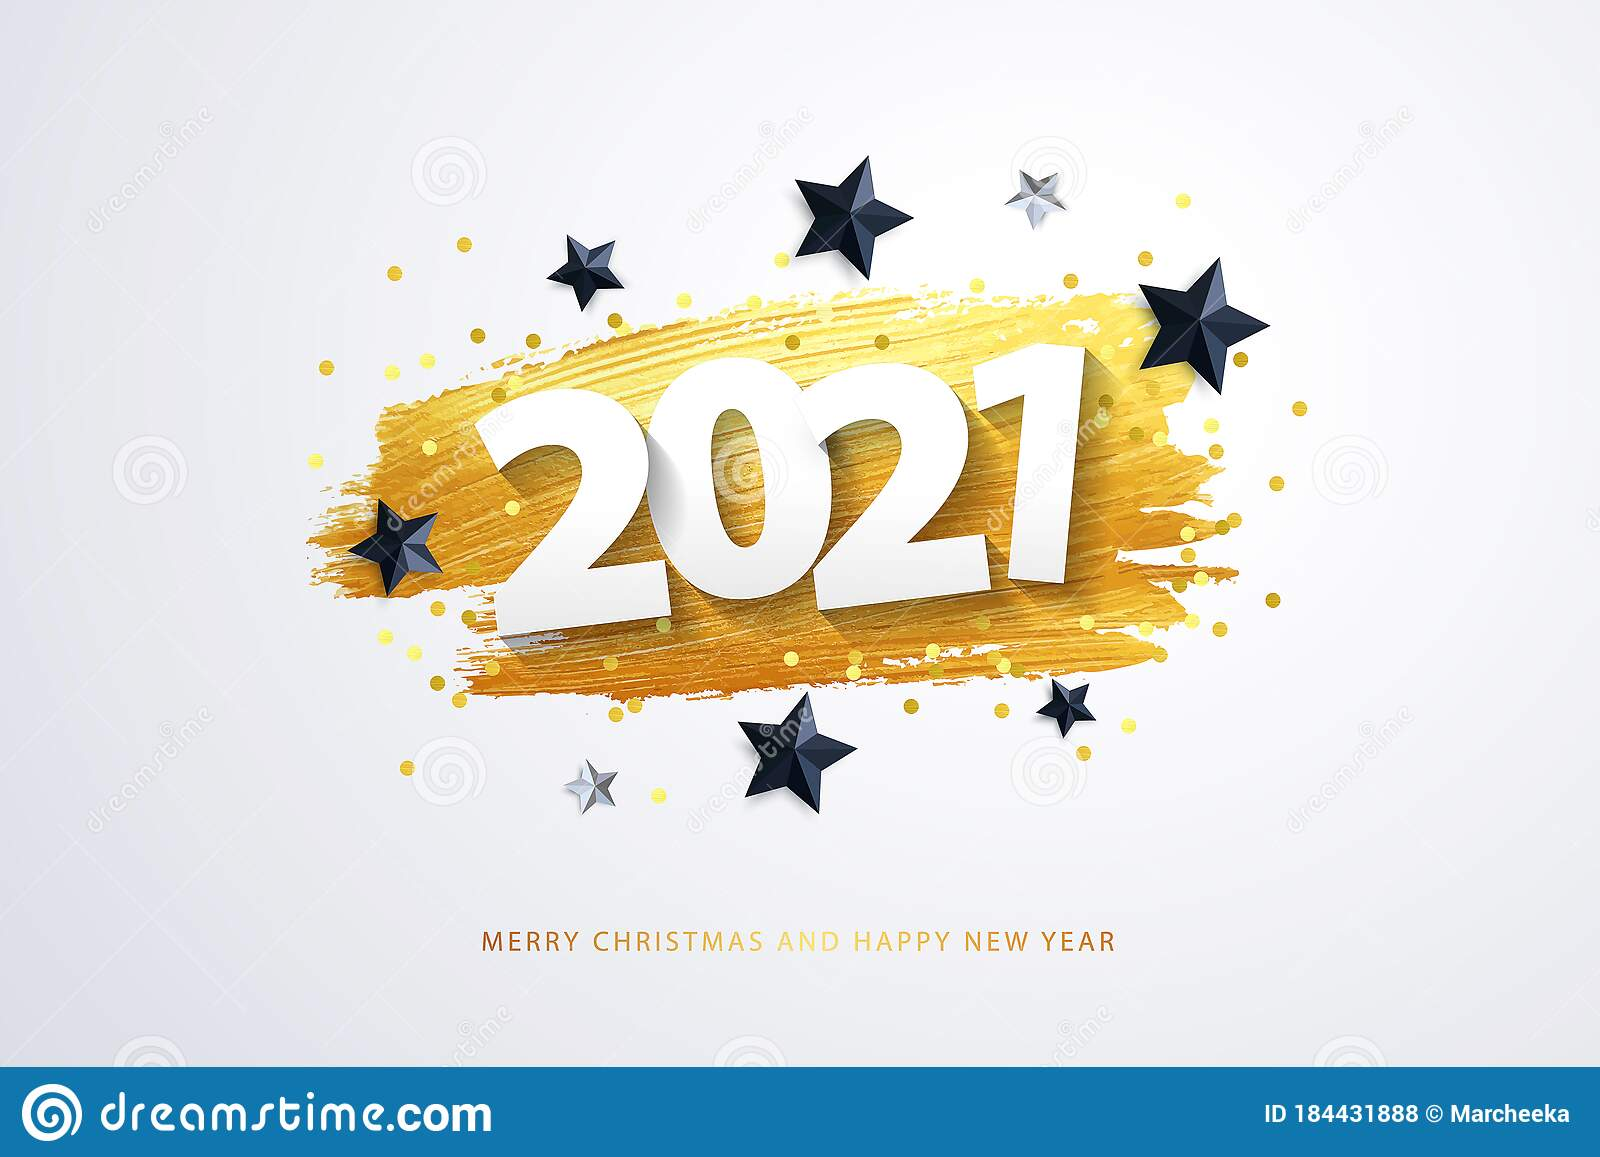 Happy New Year 2021 Vector Holiday Illustration 2021 Text Design Stock Vector Illustration Of Invitation Brush 184431888